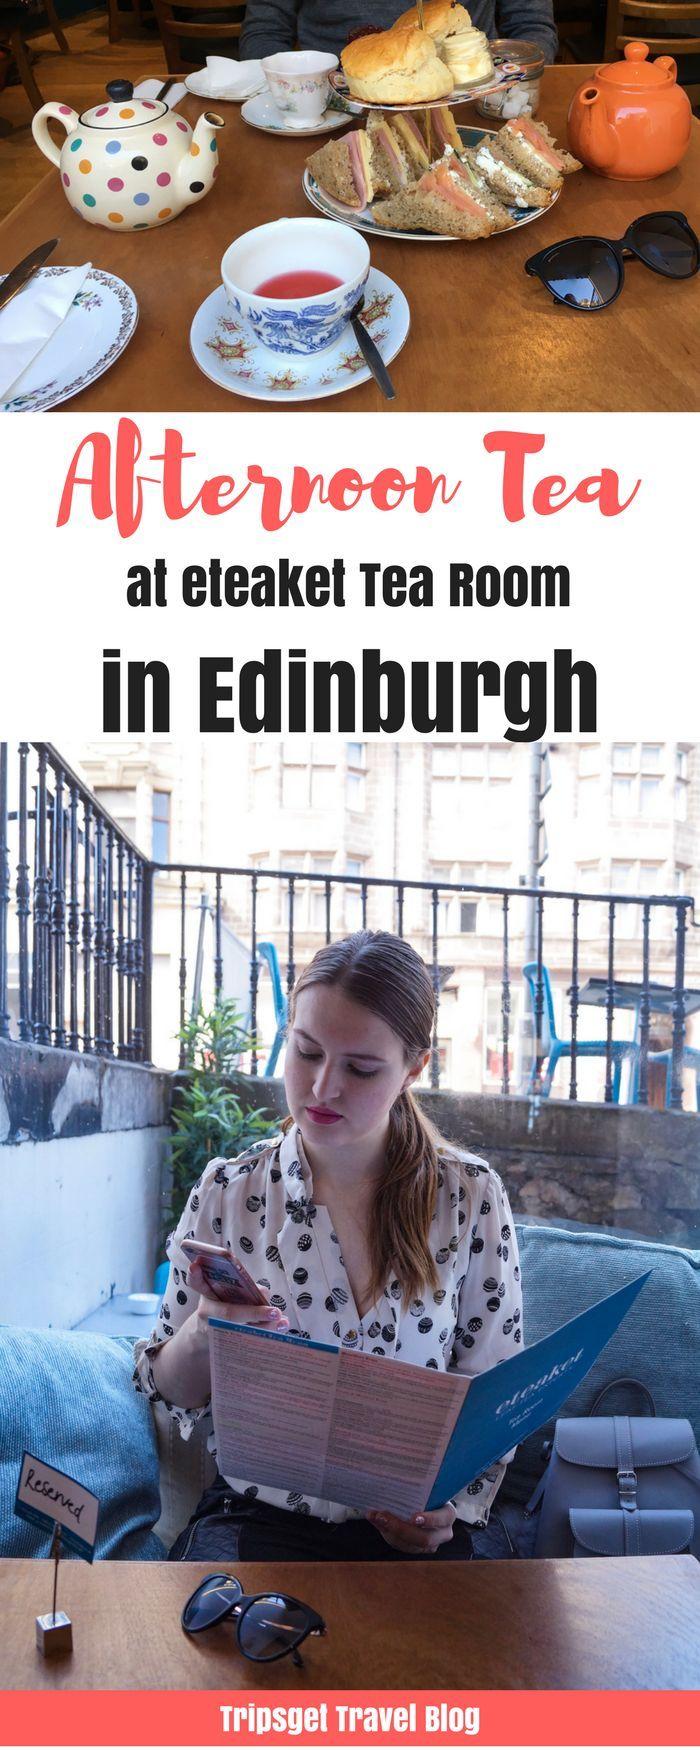 Great Afternoon Tea in Edinburgh - eteaket tea room